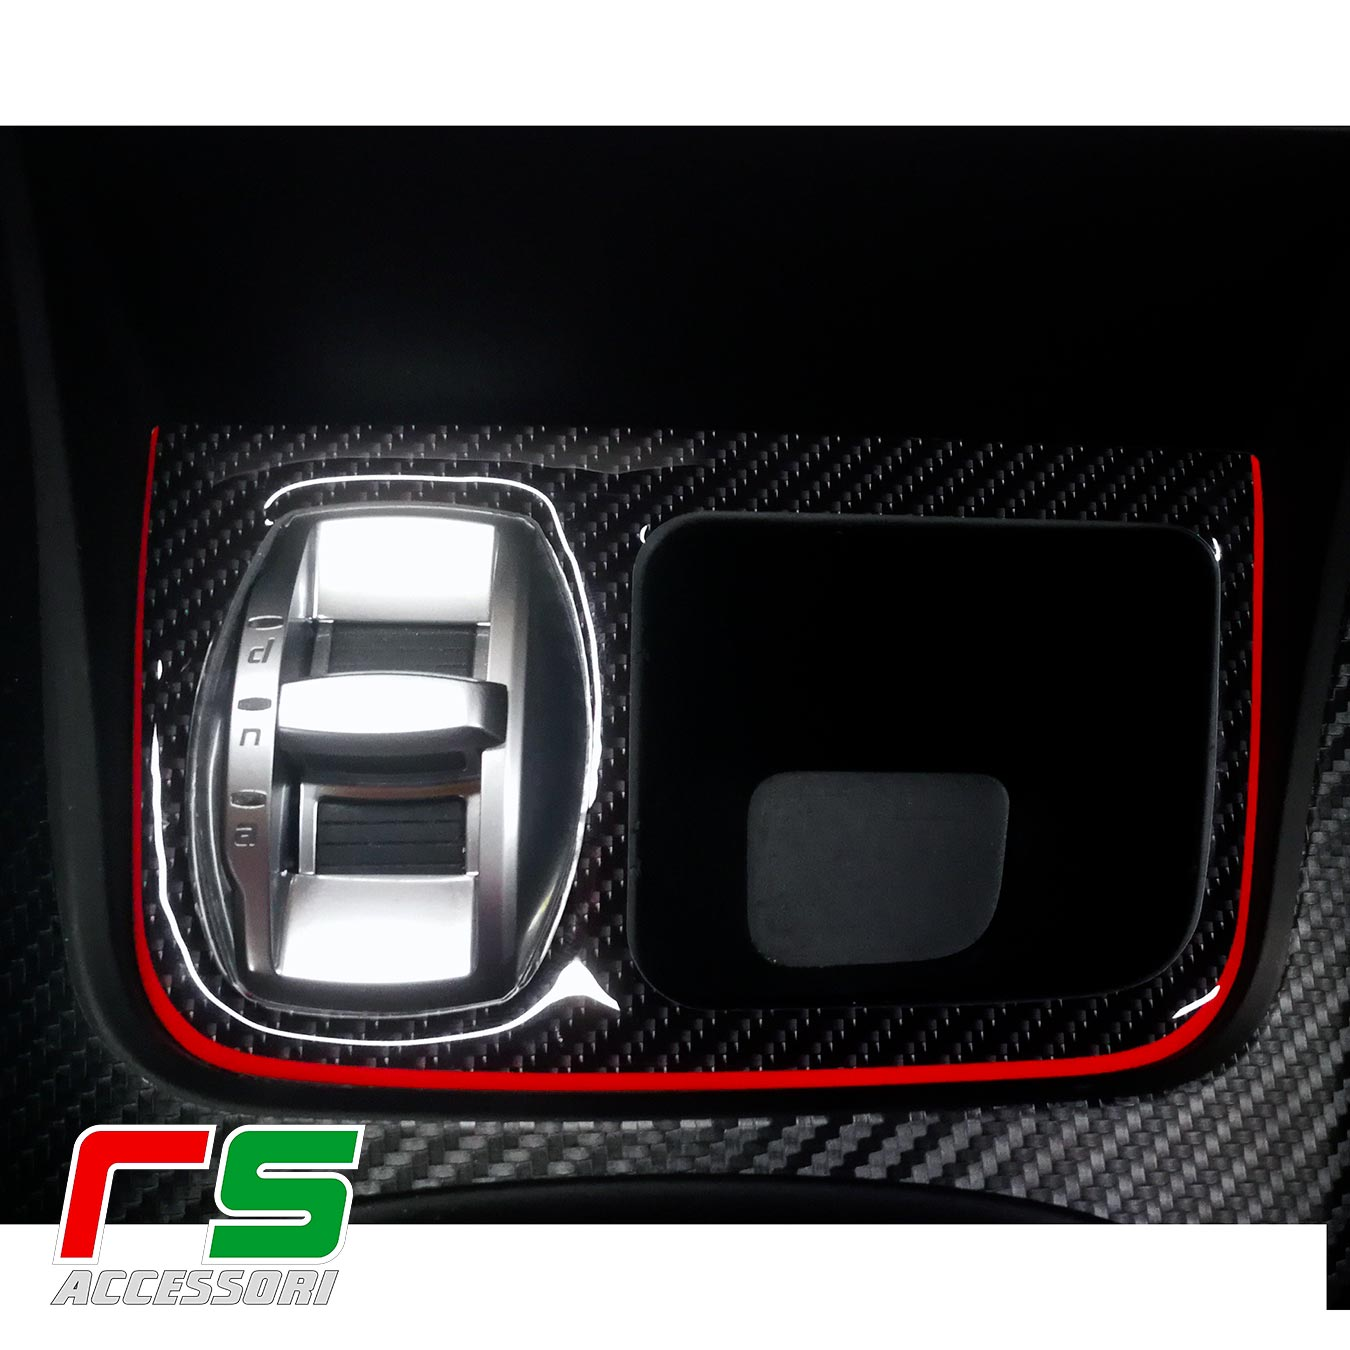 Autocollant porte-monnaie Alfa Romeo Giulietta en look carbone